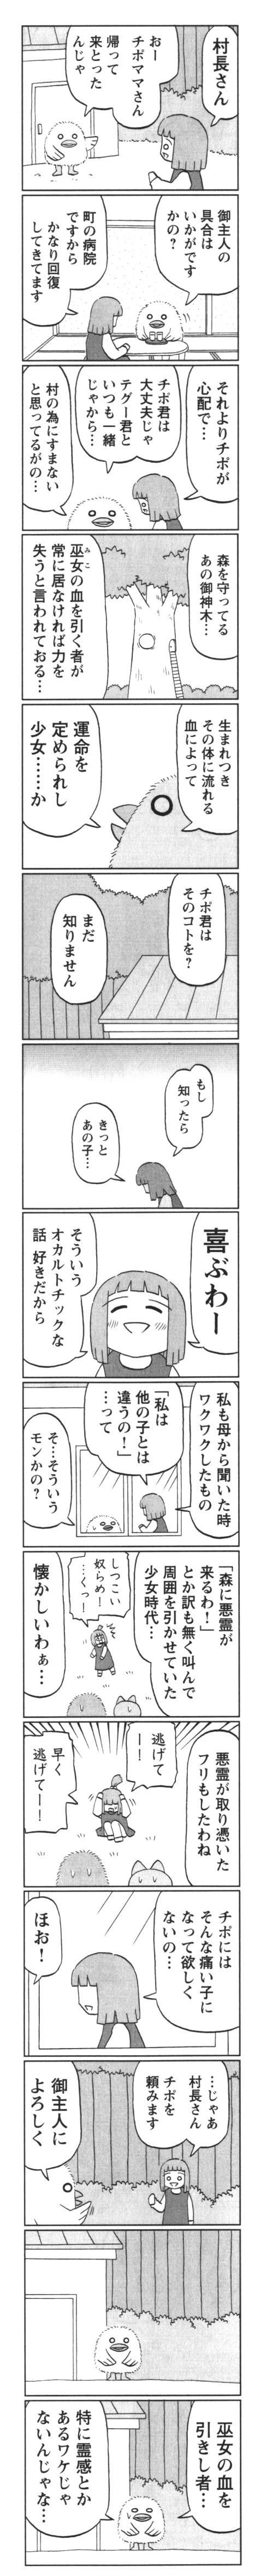 tg14-2